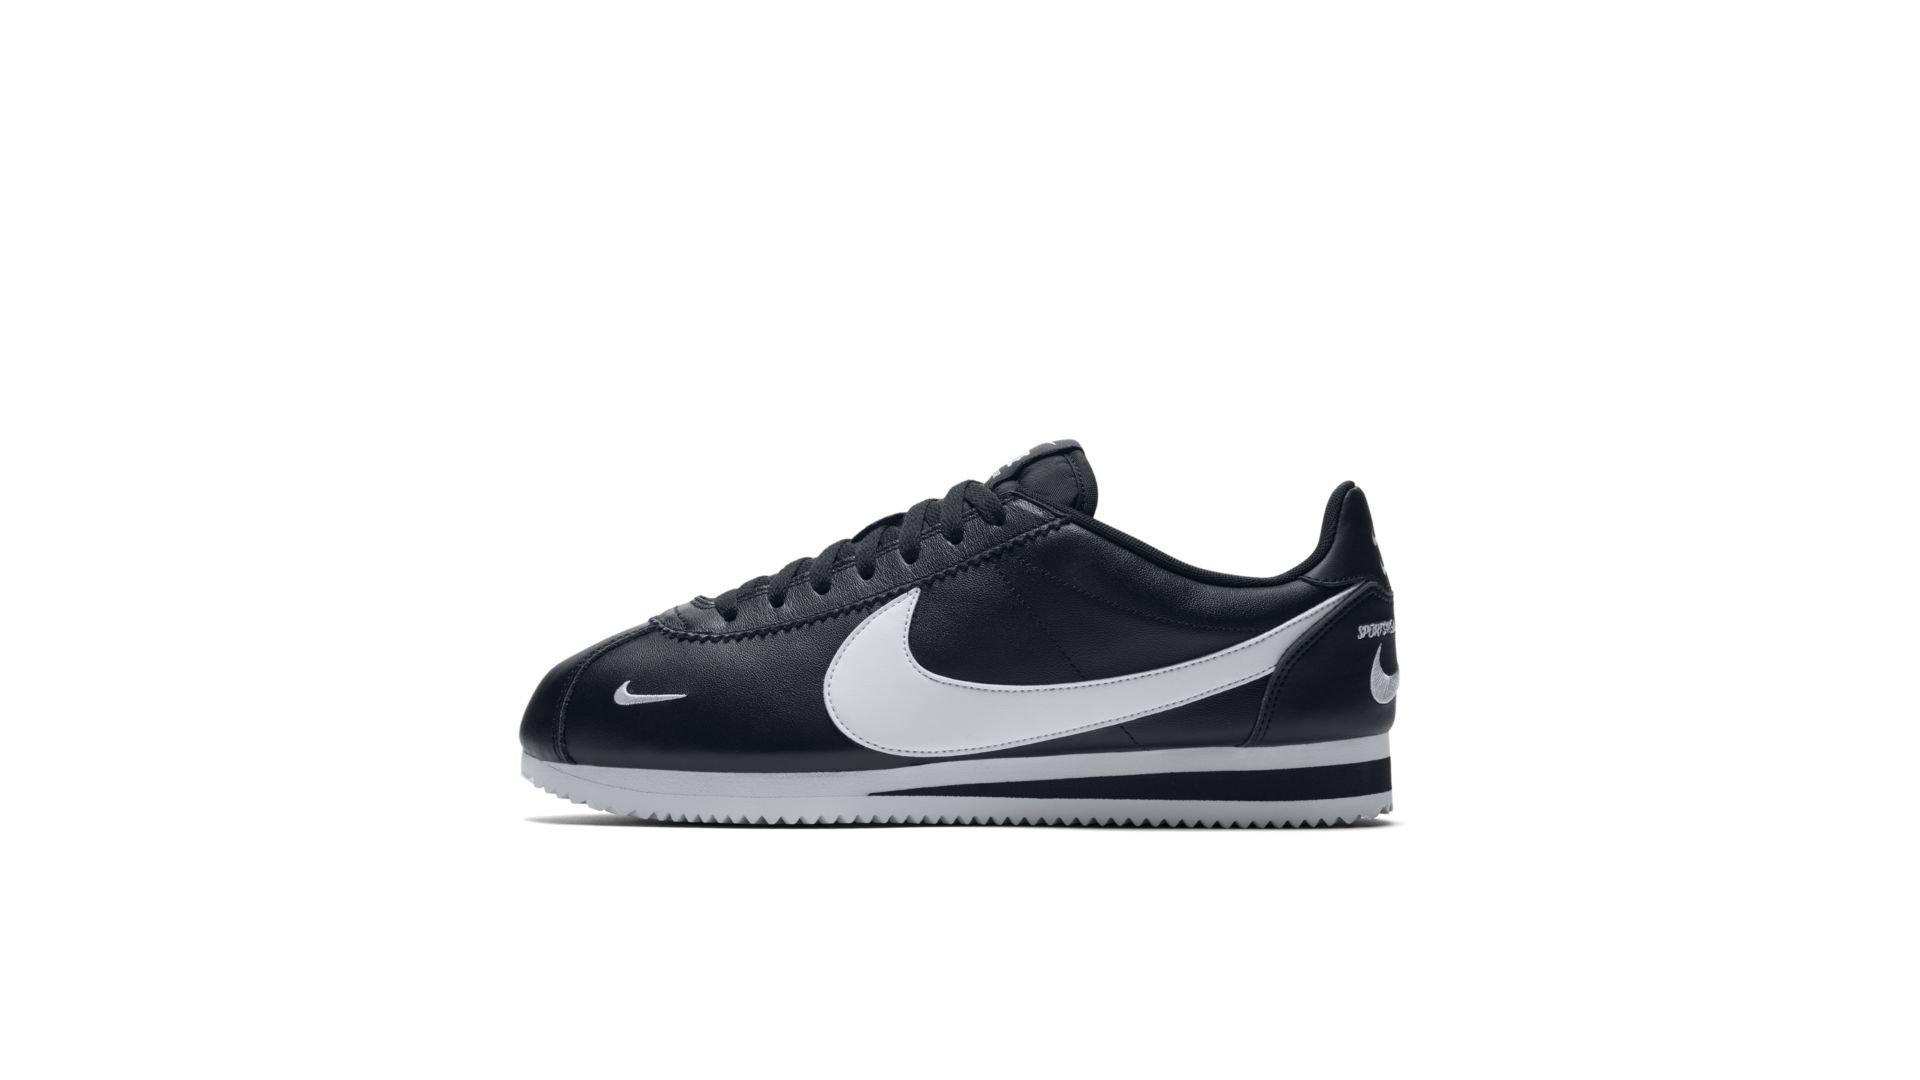 Nike Classic Cortez Mini Swoosh Black White (807480-004)